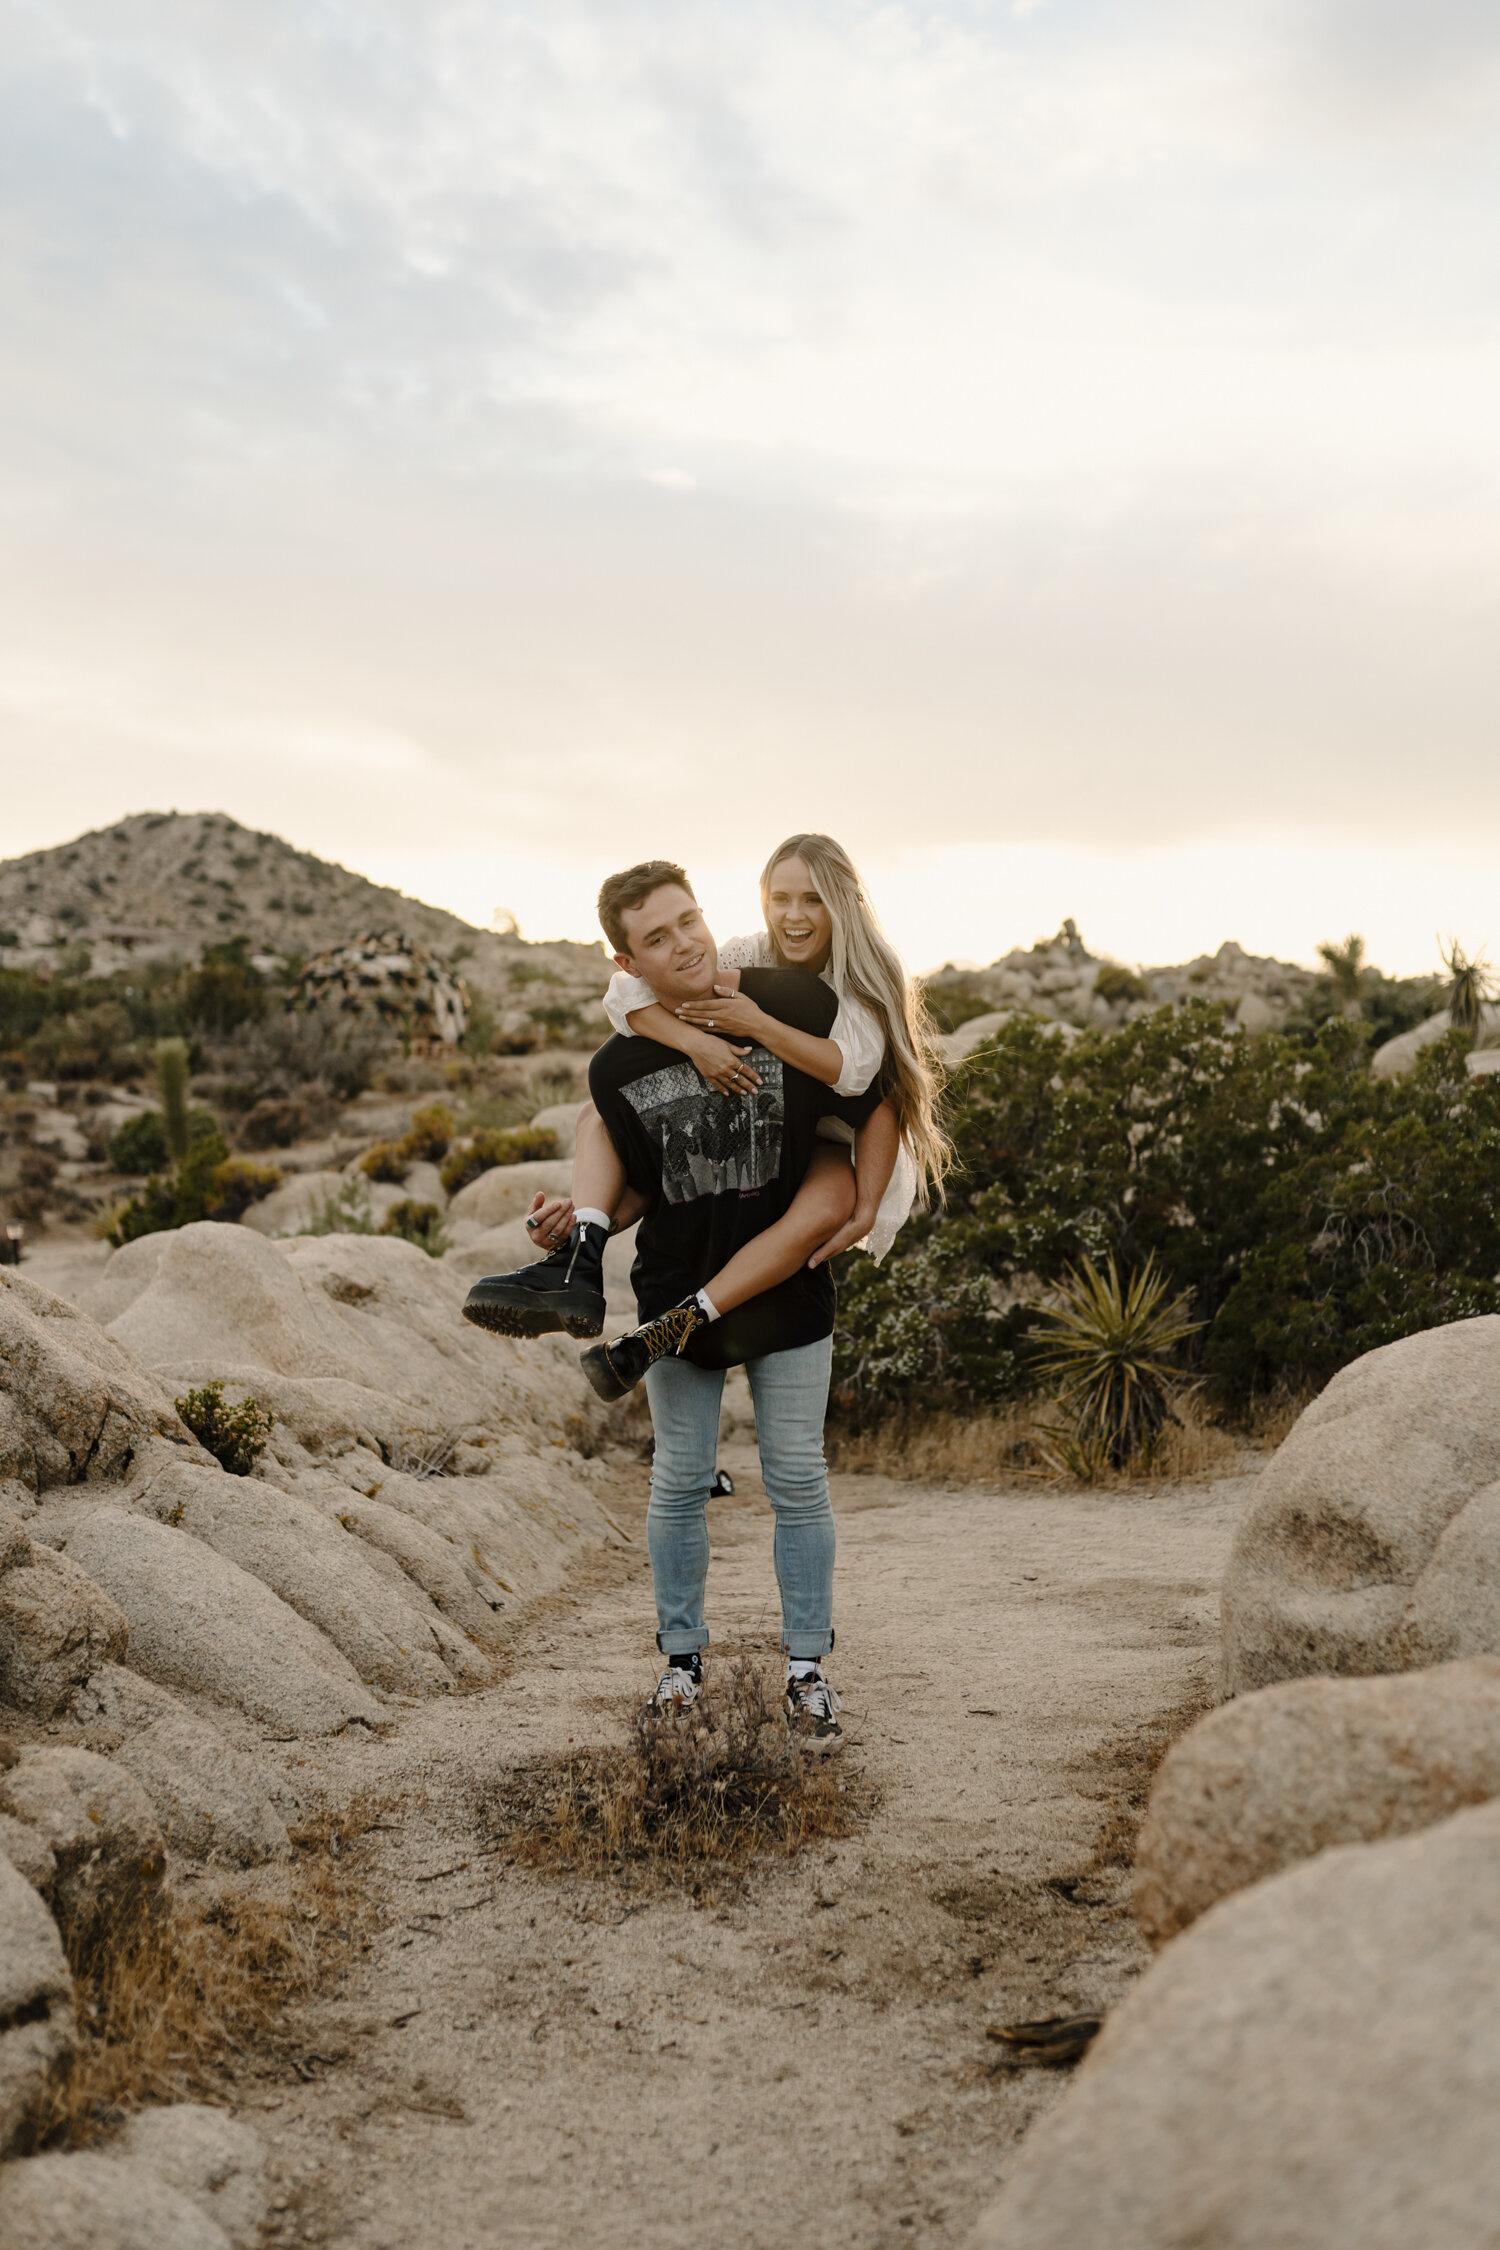 Joshua Tree, California golden hour engagement session, couple goofying off   by Kayli LaFon Photography